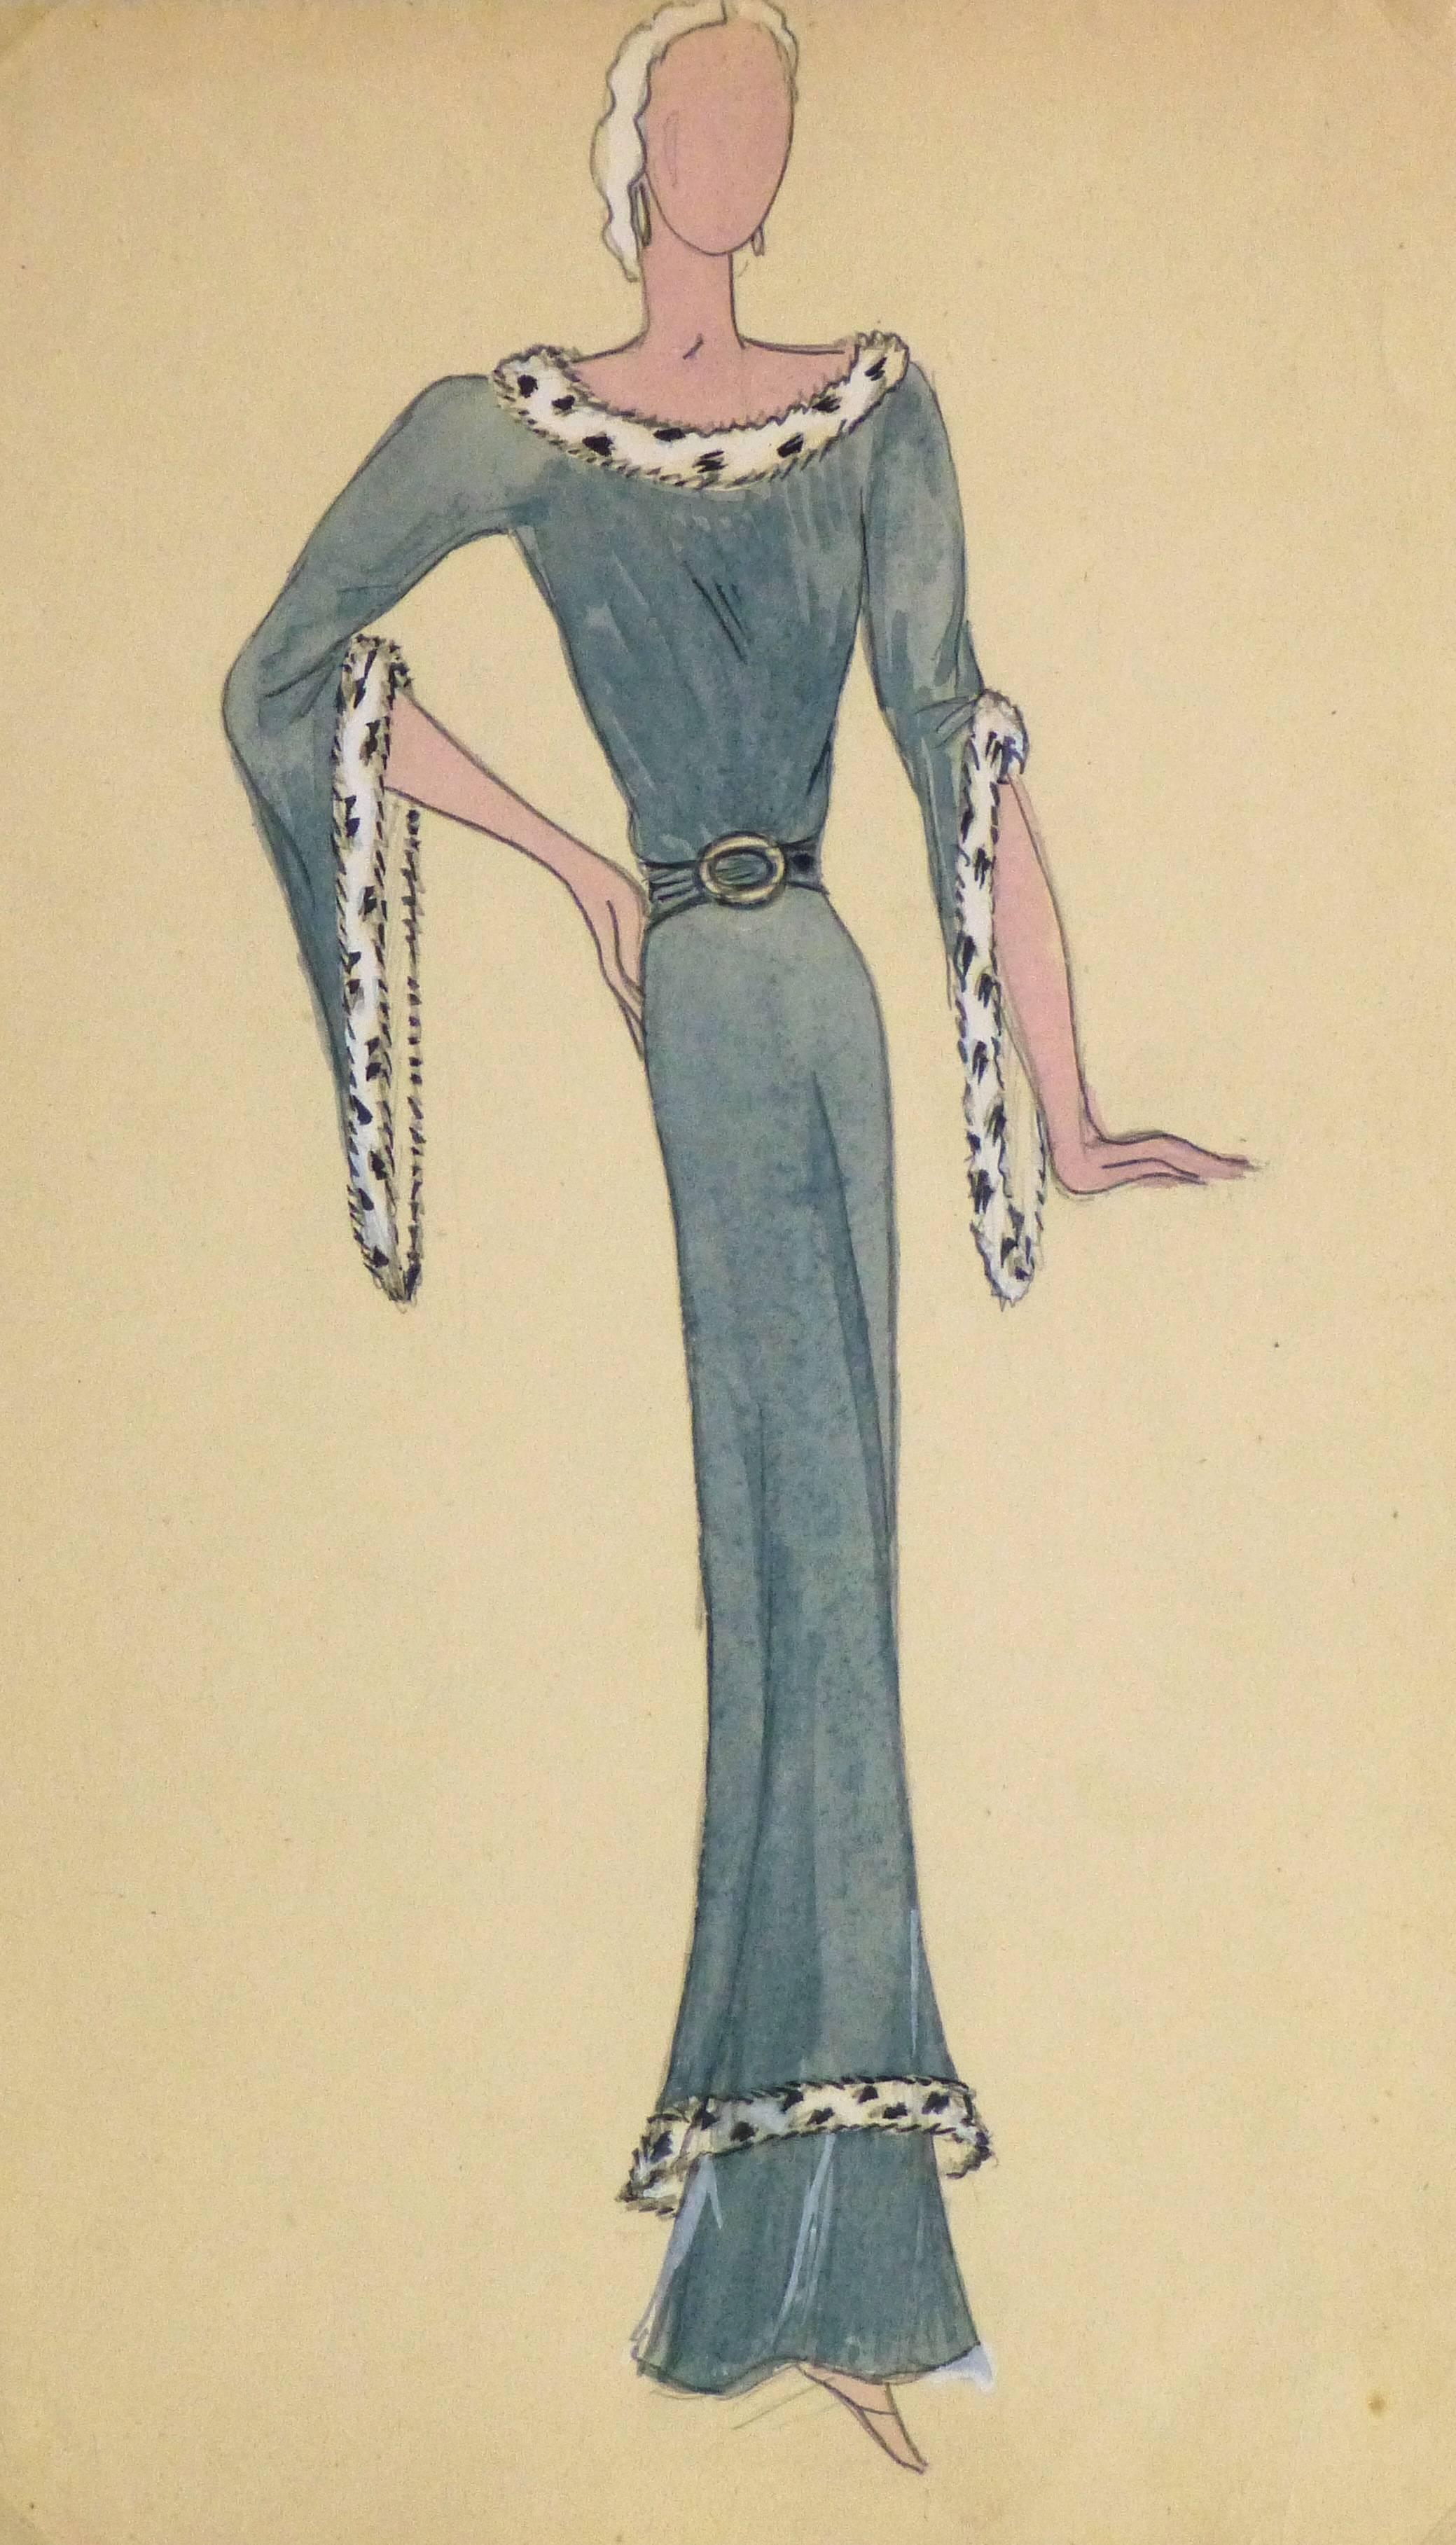 French Fashion Sketch - Fur Trimmed Evening Dress